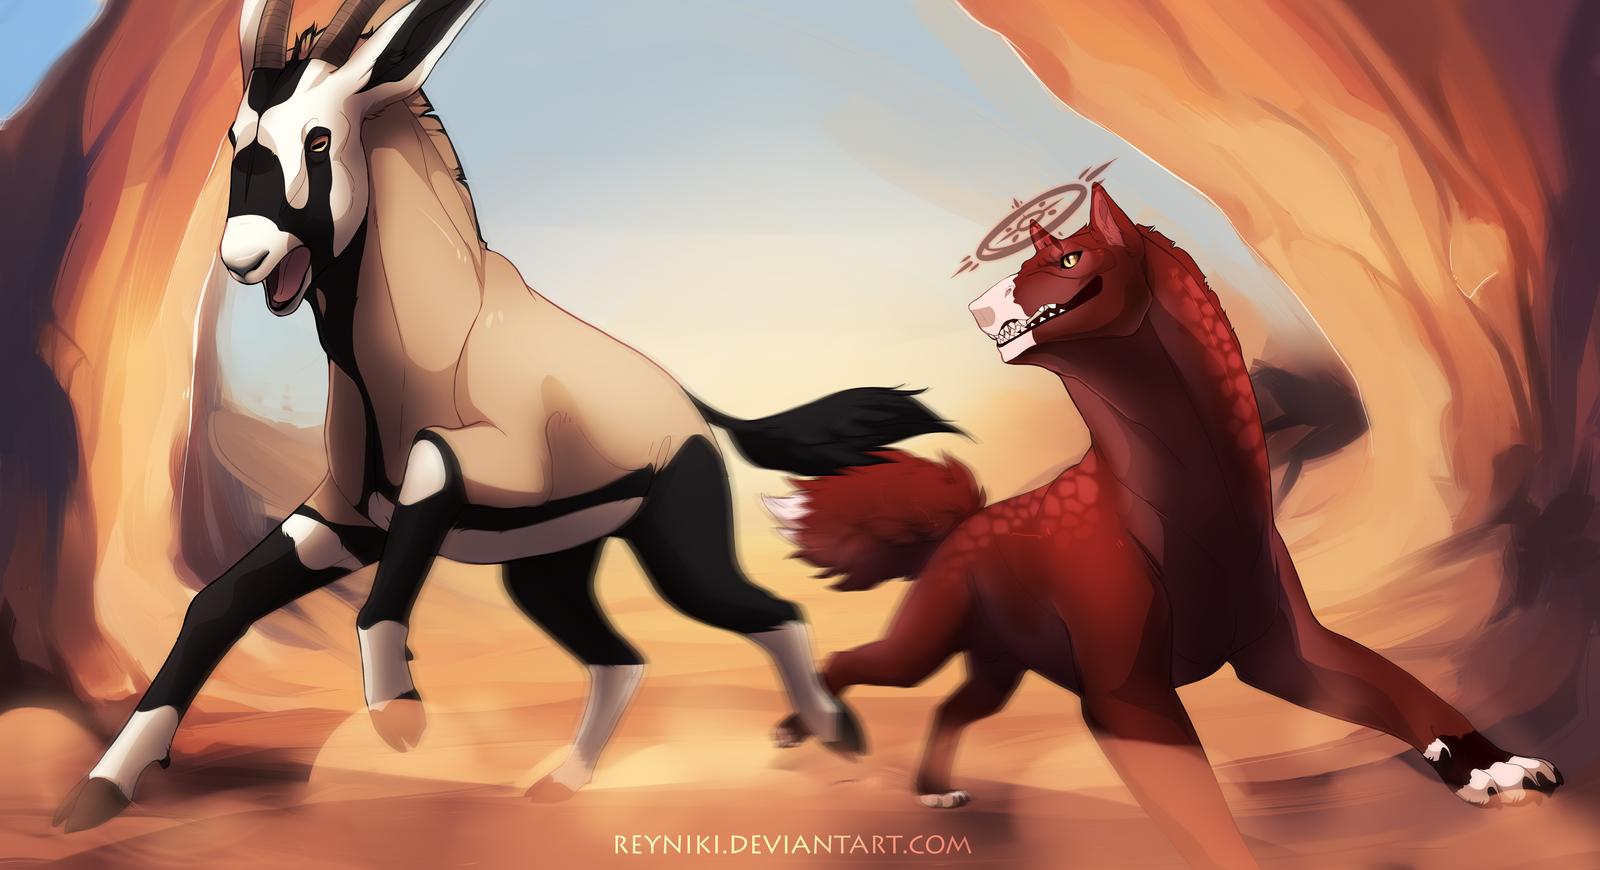 [ARPG] Into Hell's Gate by Reyniki